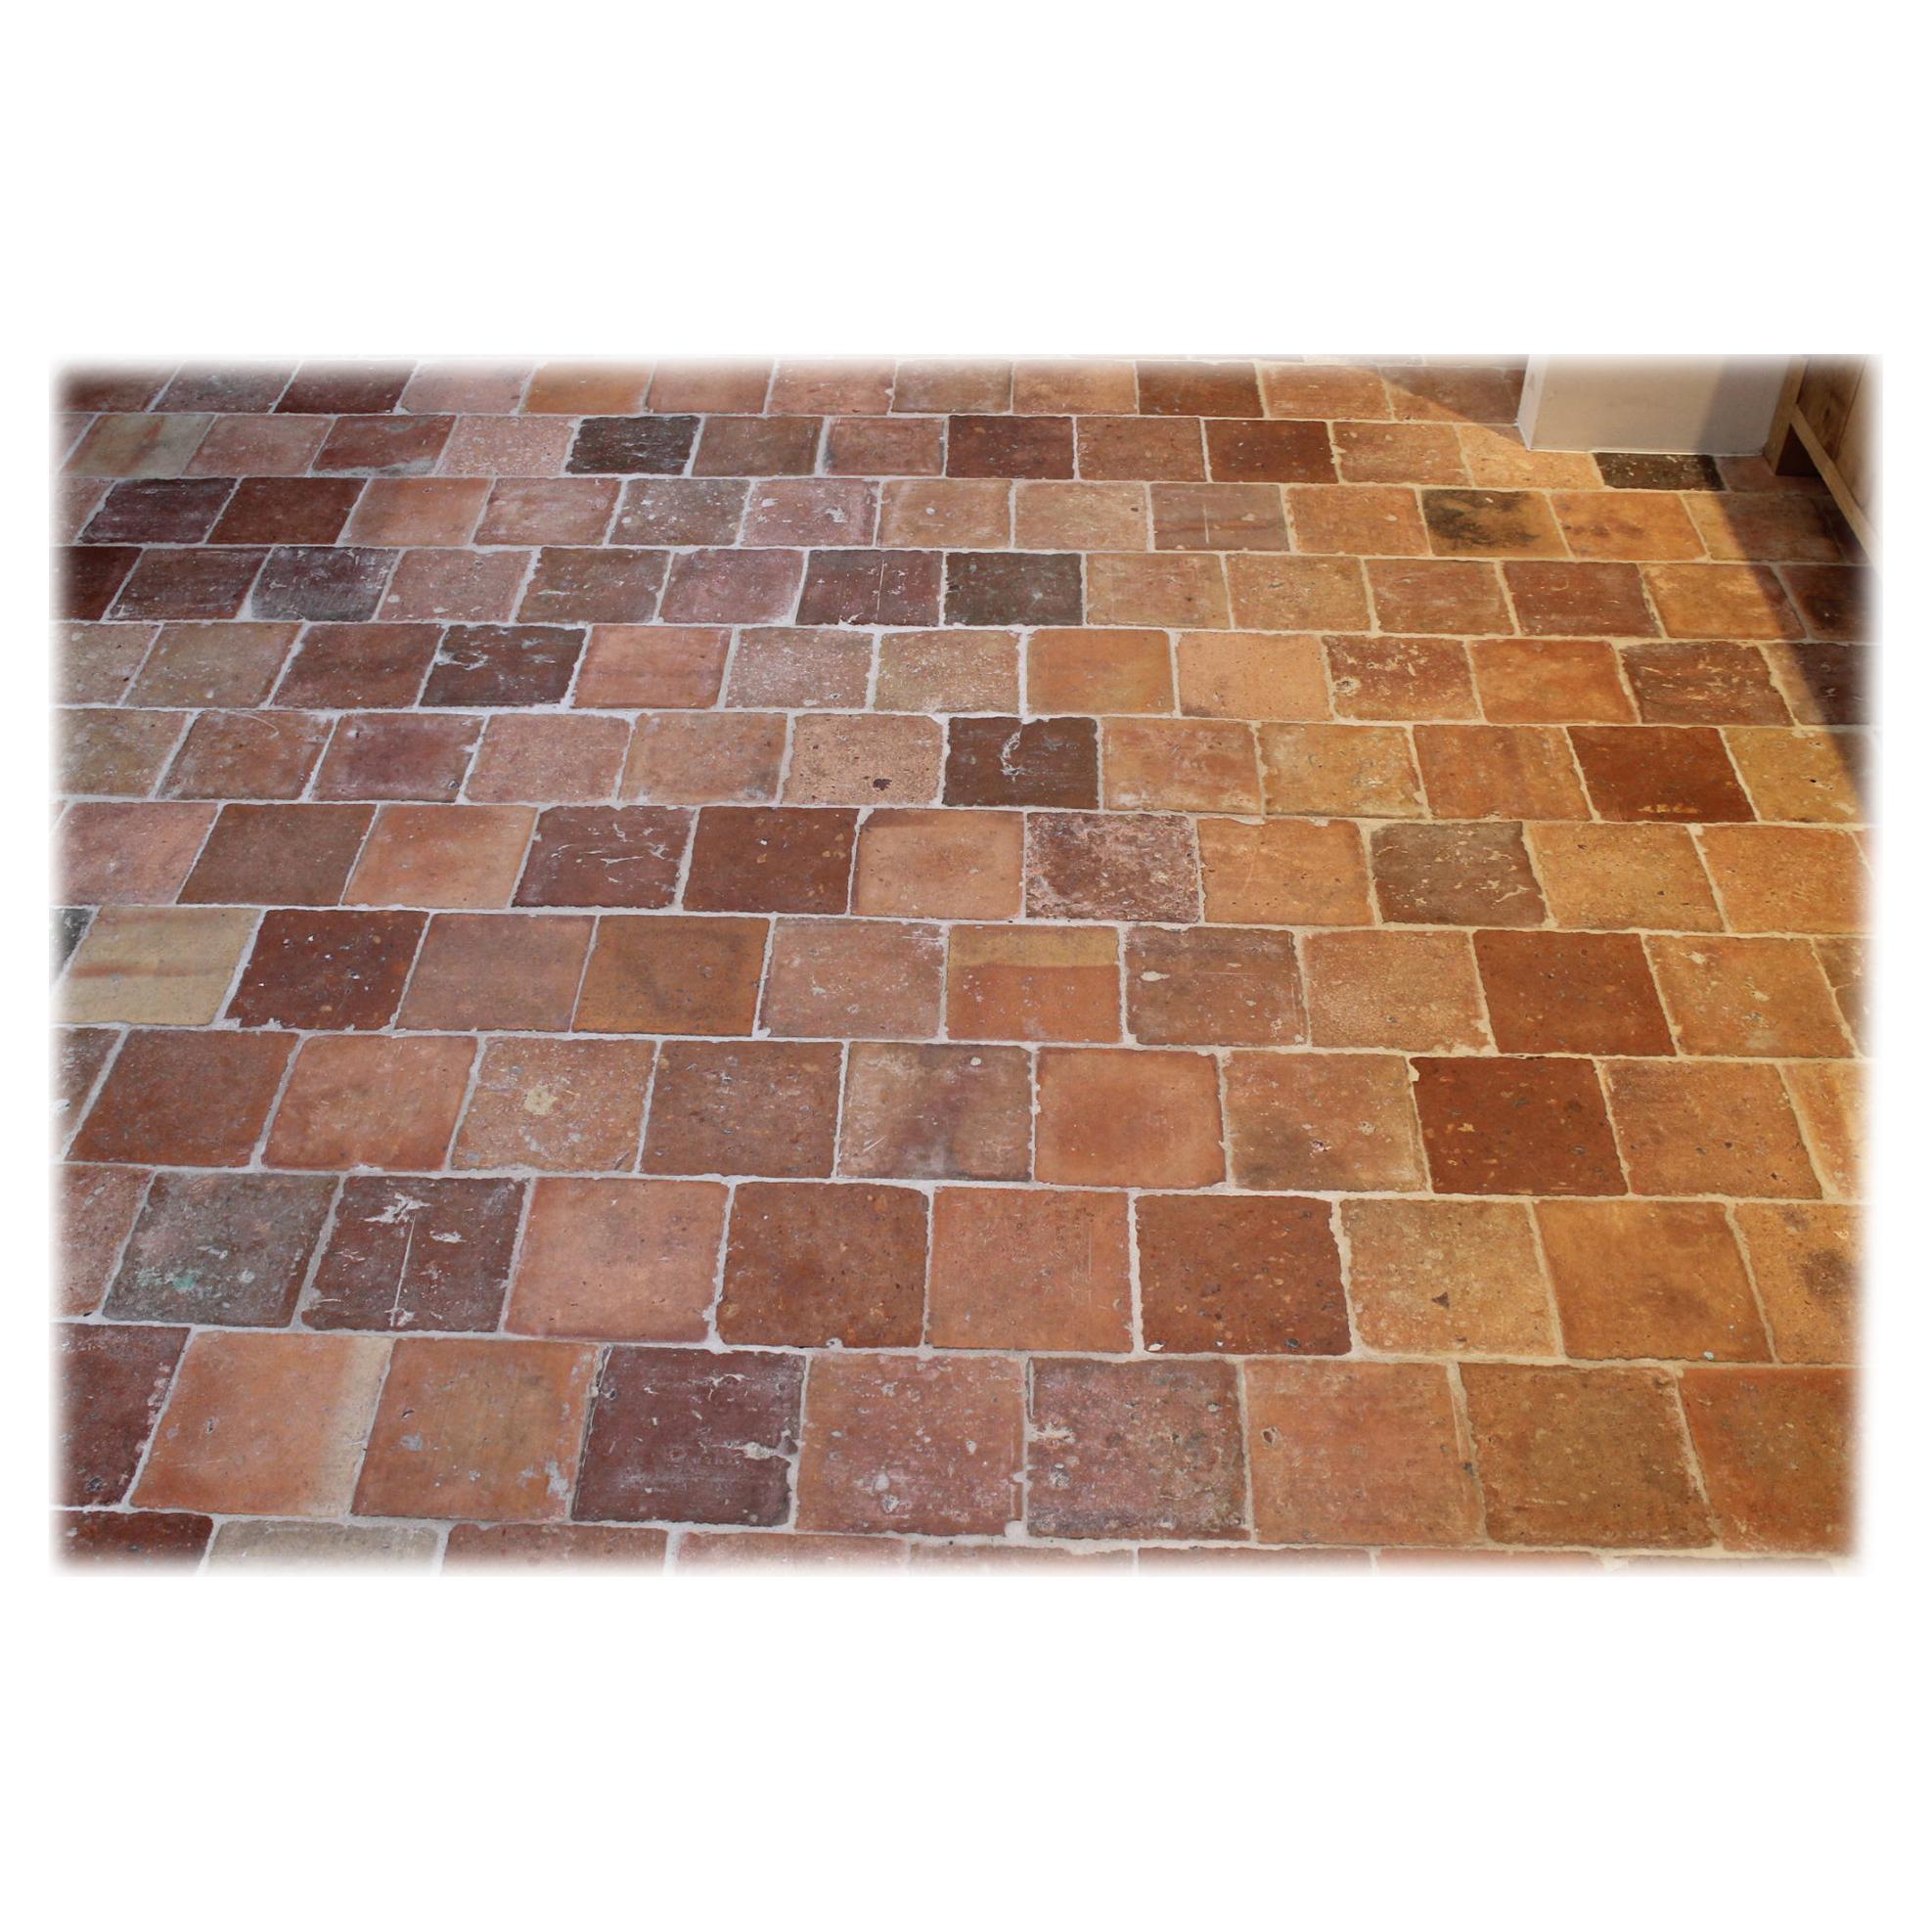 Antique French Salmon Nuanced Terracotta Floor Tiles